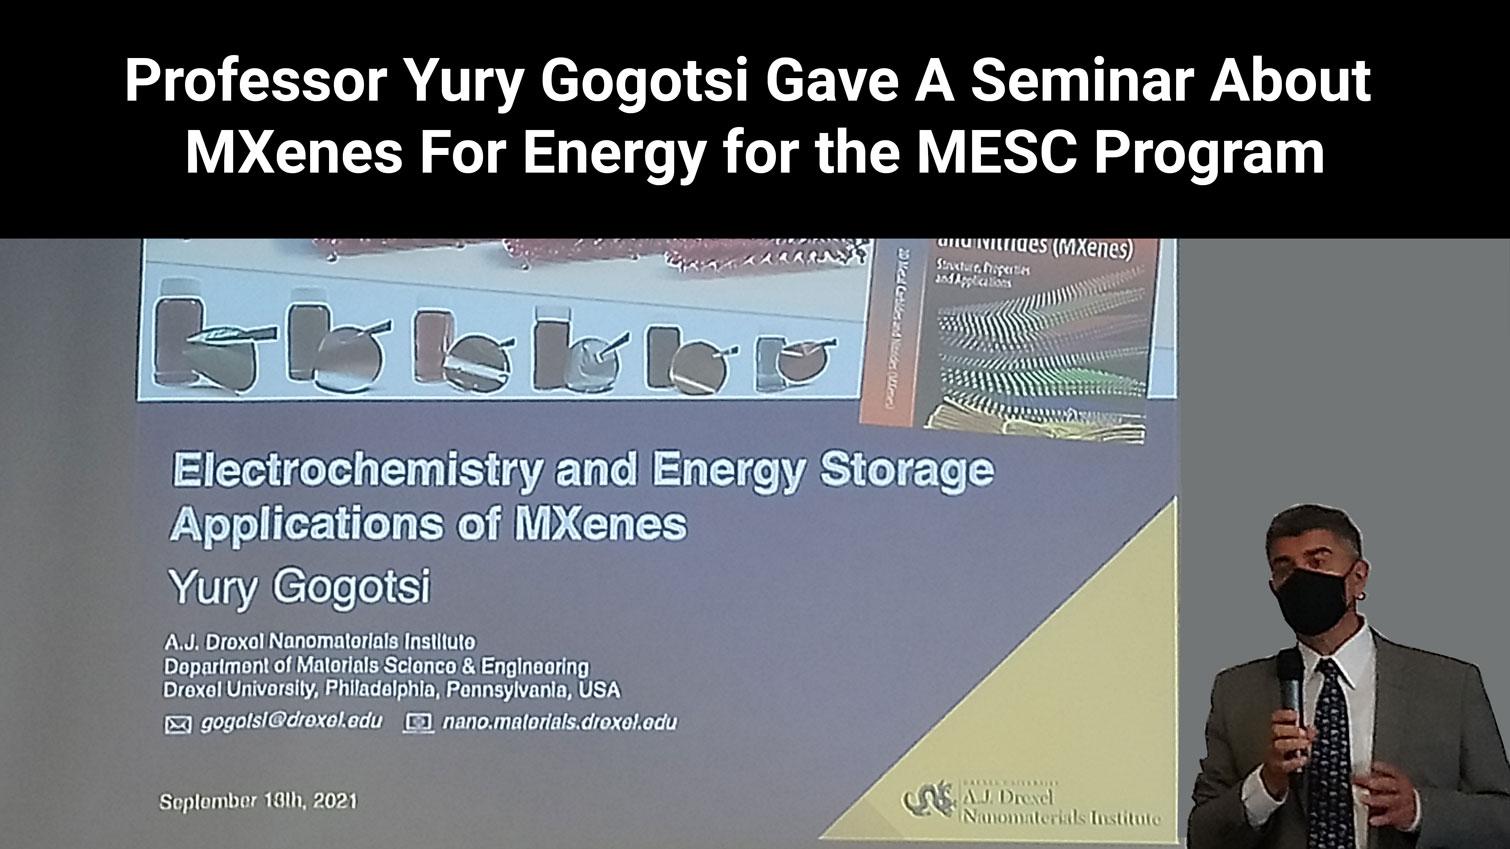 Professor Yury Gogotsi Gave A Seminar About MXenes For Energy for the MESC+ Program